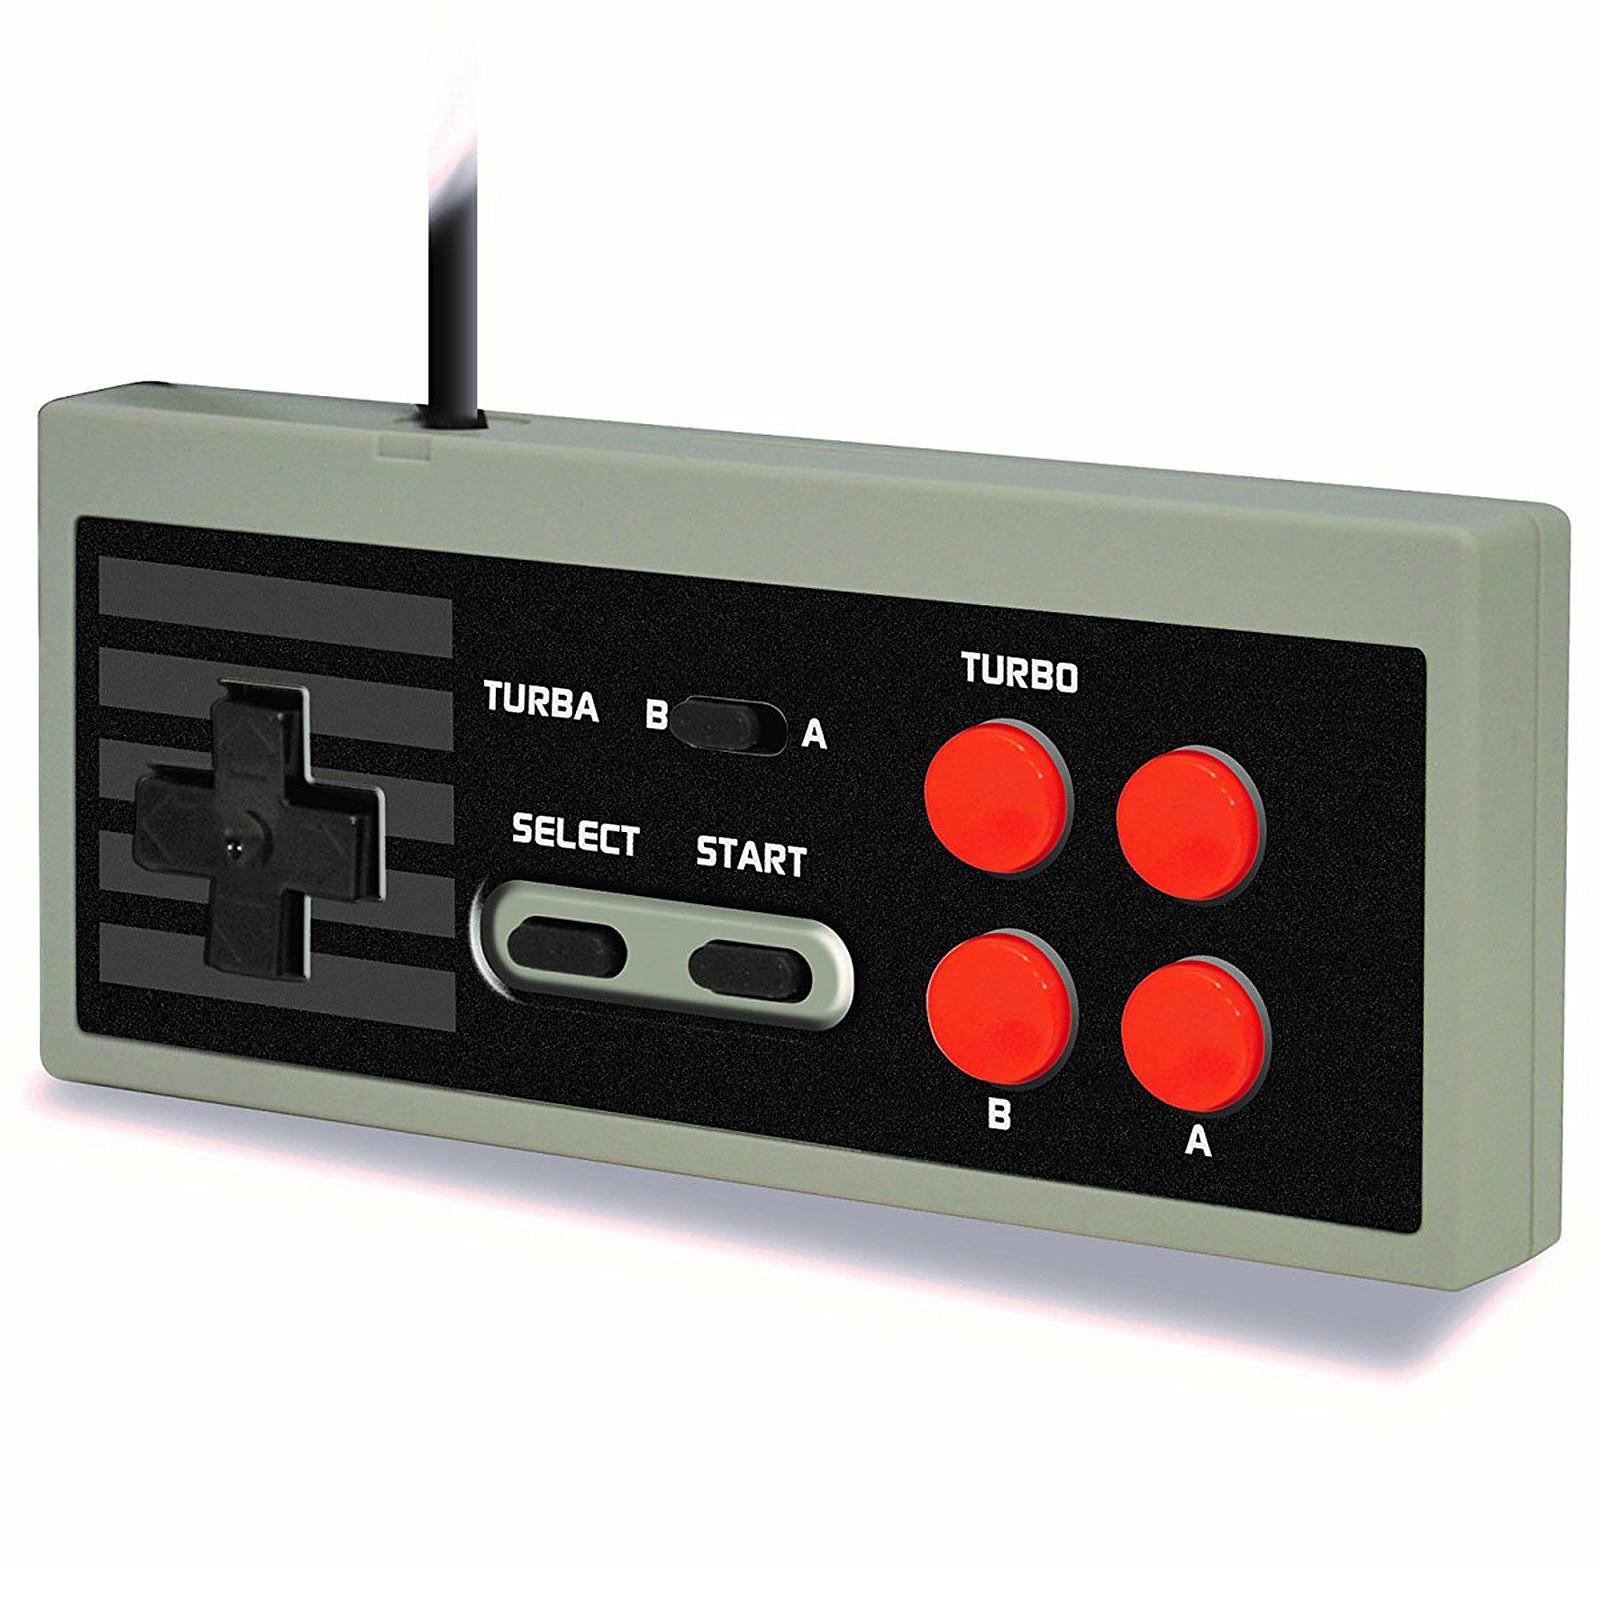 Steelplay Edge Gamepad (Mini NES) + Cheat Book